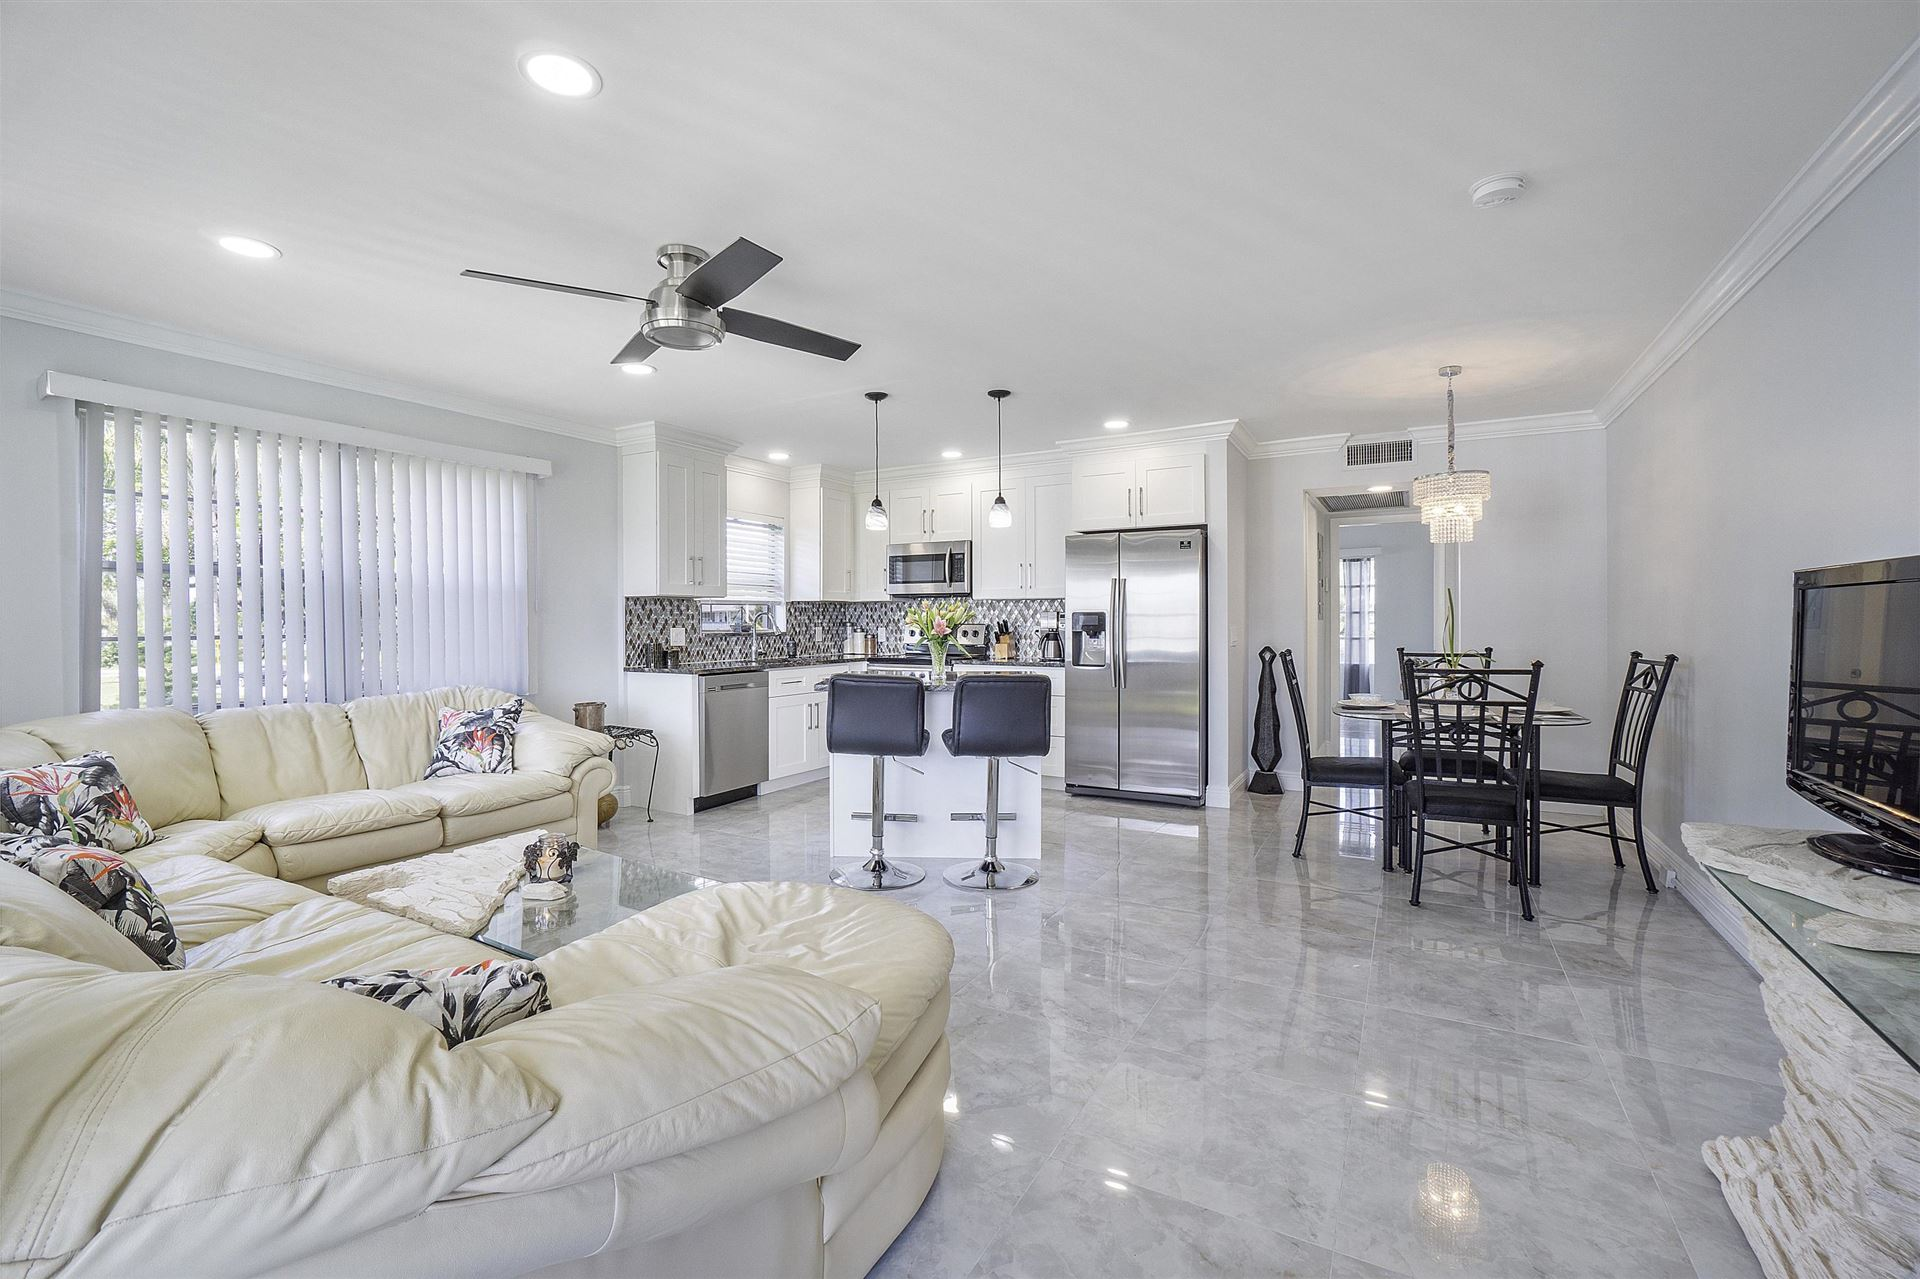 273 Oakridge P #273, Deerfield Beach, FL 33442 - MLS#: RX-10700996